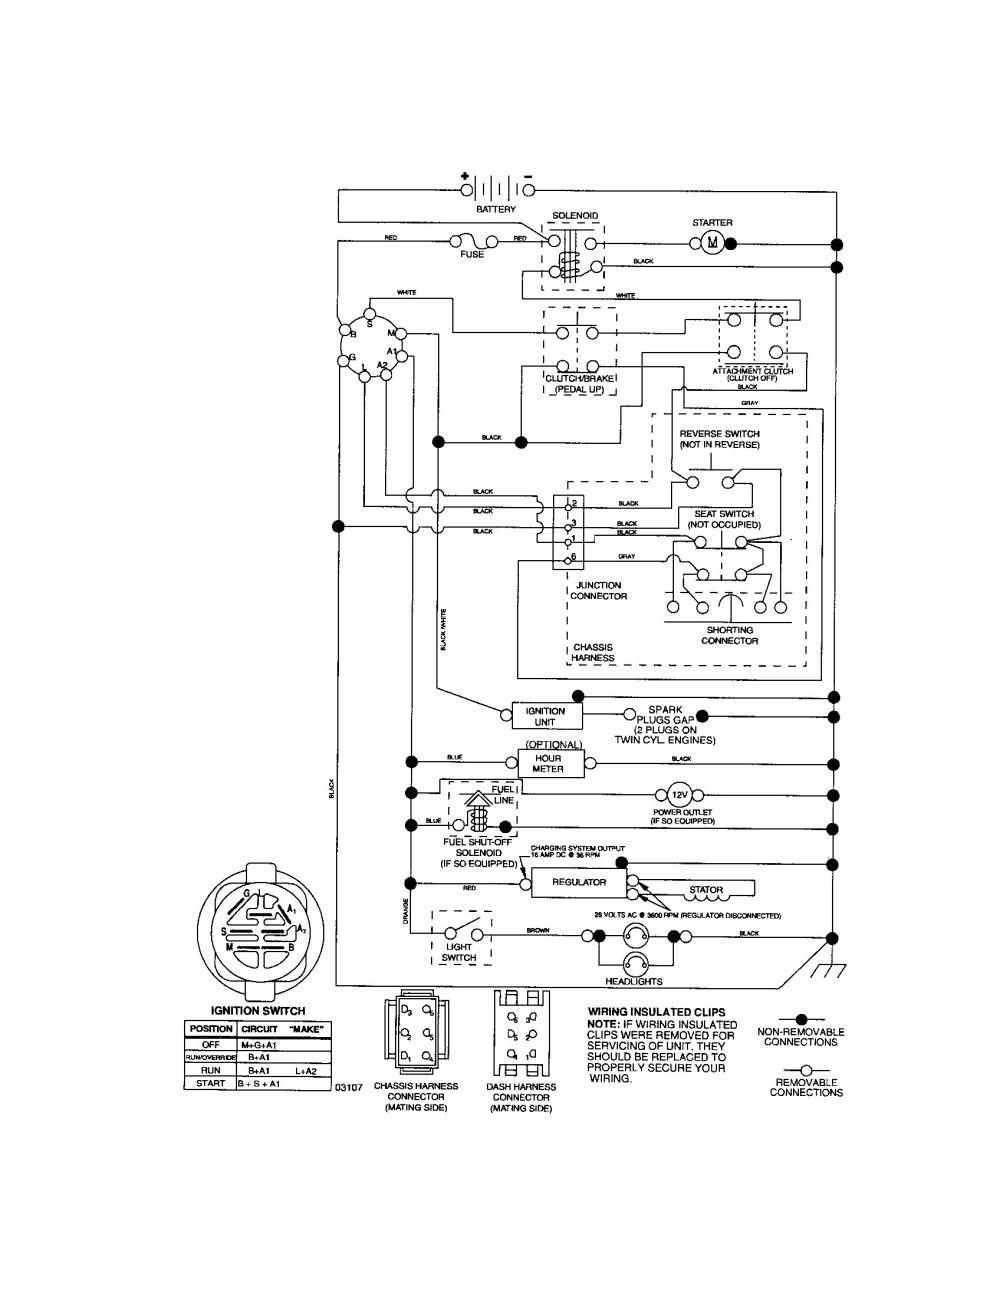 medium resolution of yard machine wiring diagram wiring diagram image troy bilt lawn tractor wiring electrical wiring diagram for yard machine mtd